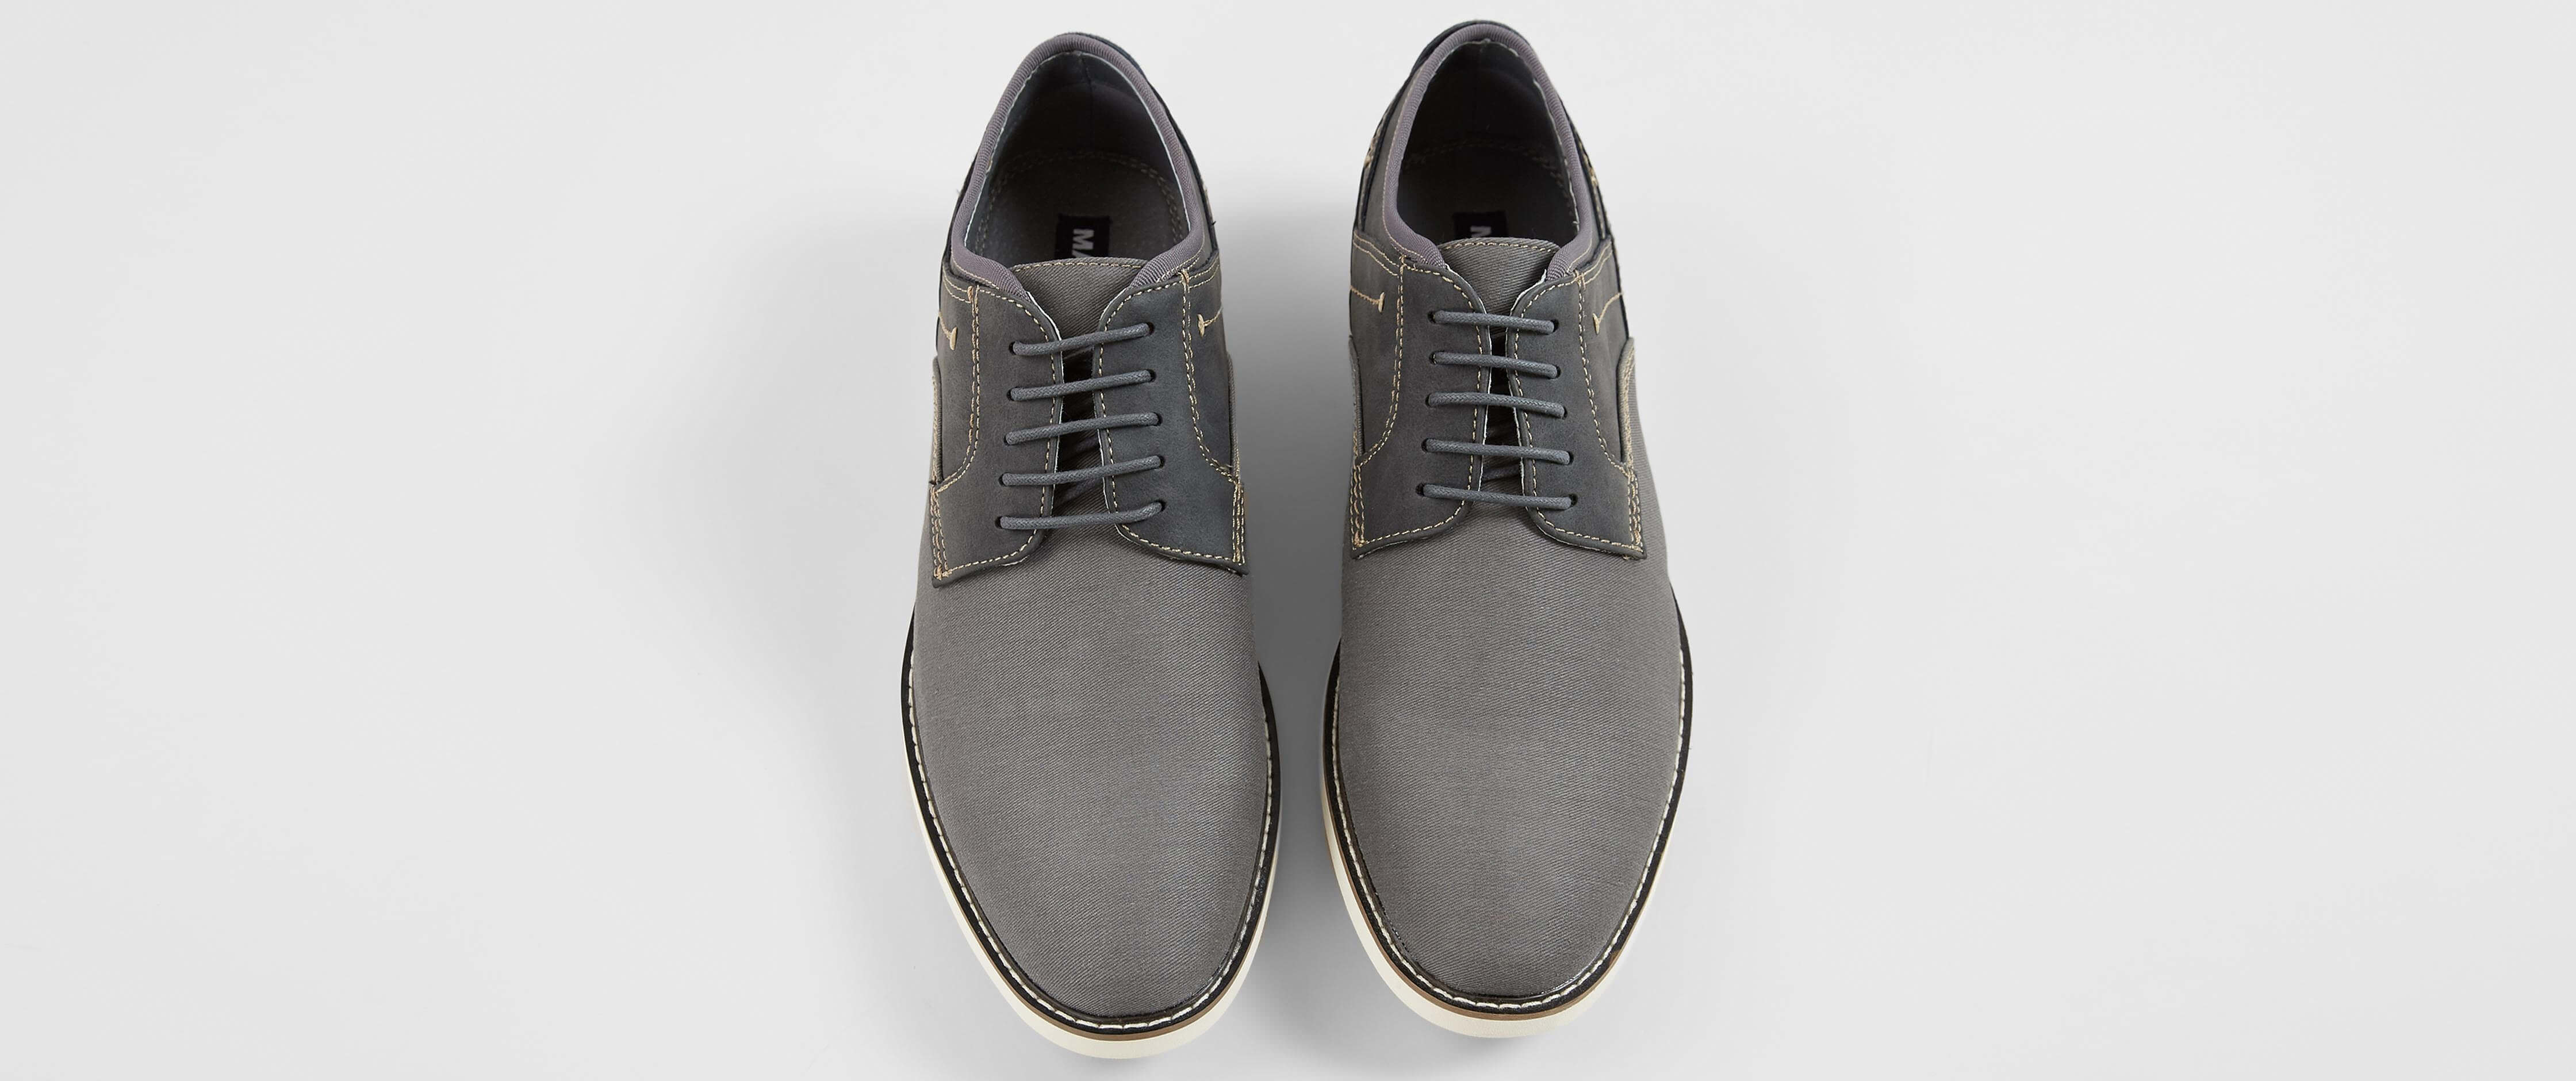 c1ede226981 Steve Madden M-Deene Shoe [7SwPm1109574] - $36.99